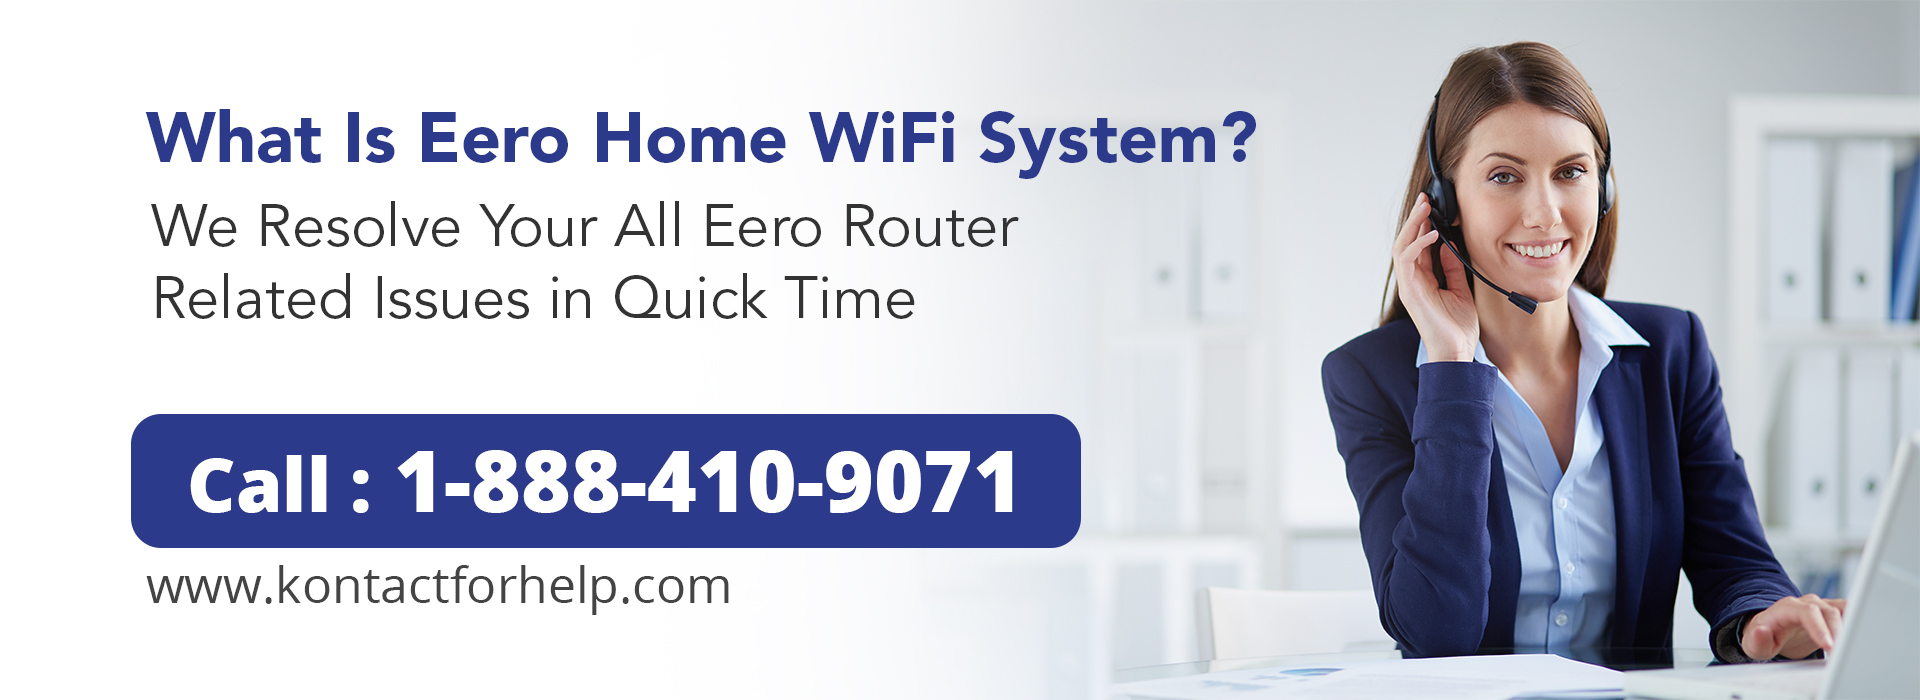 Eero Customer Service 1-888-410-9071